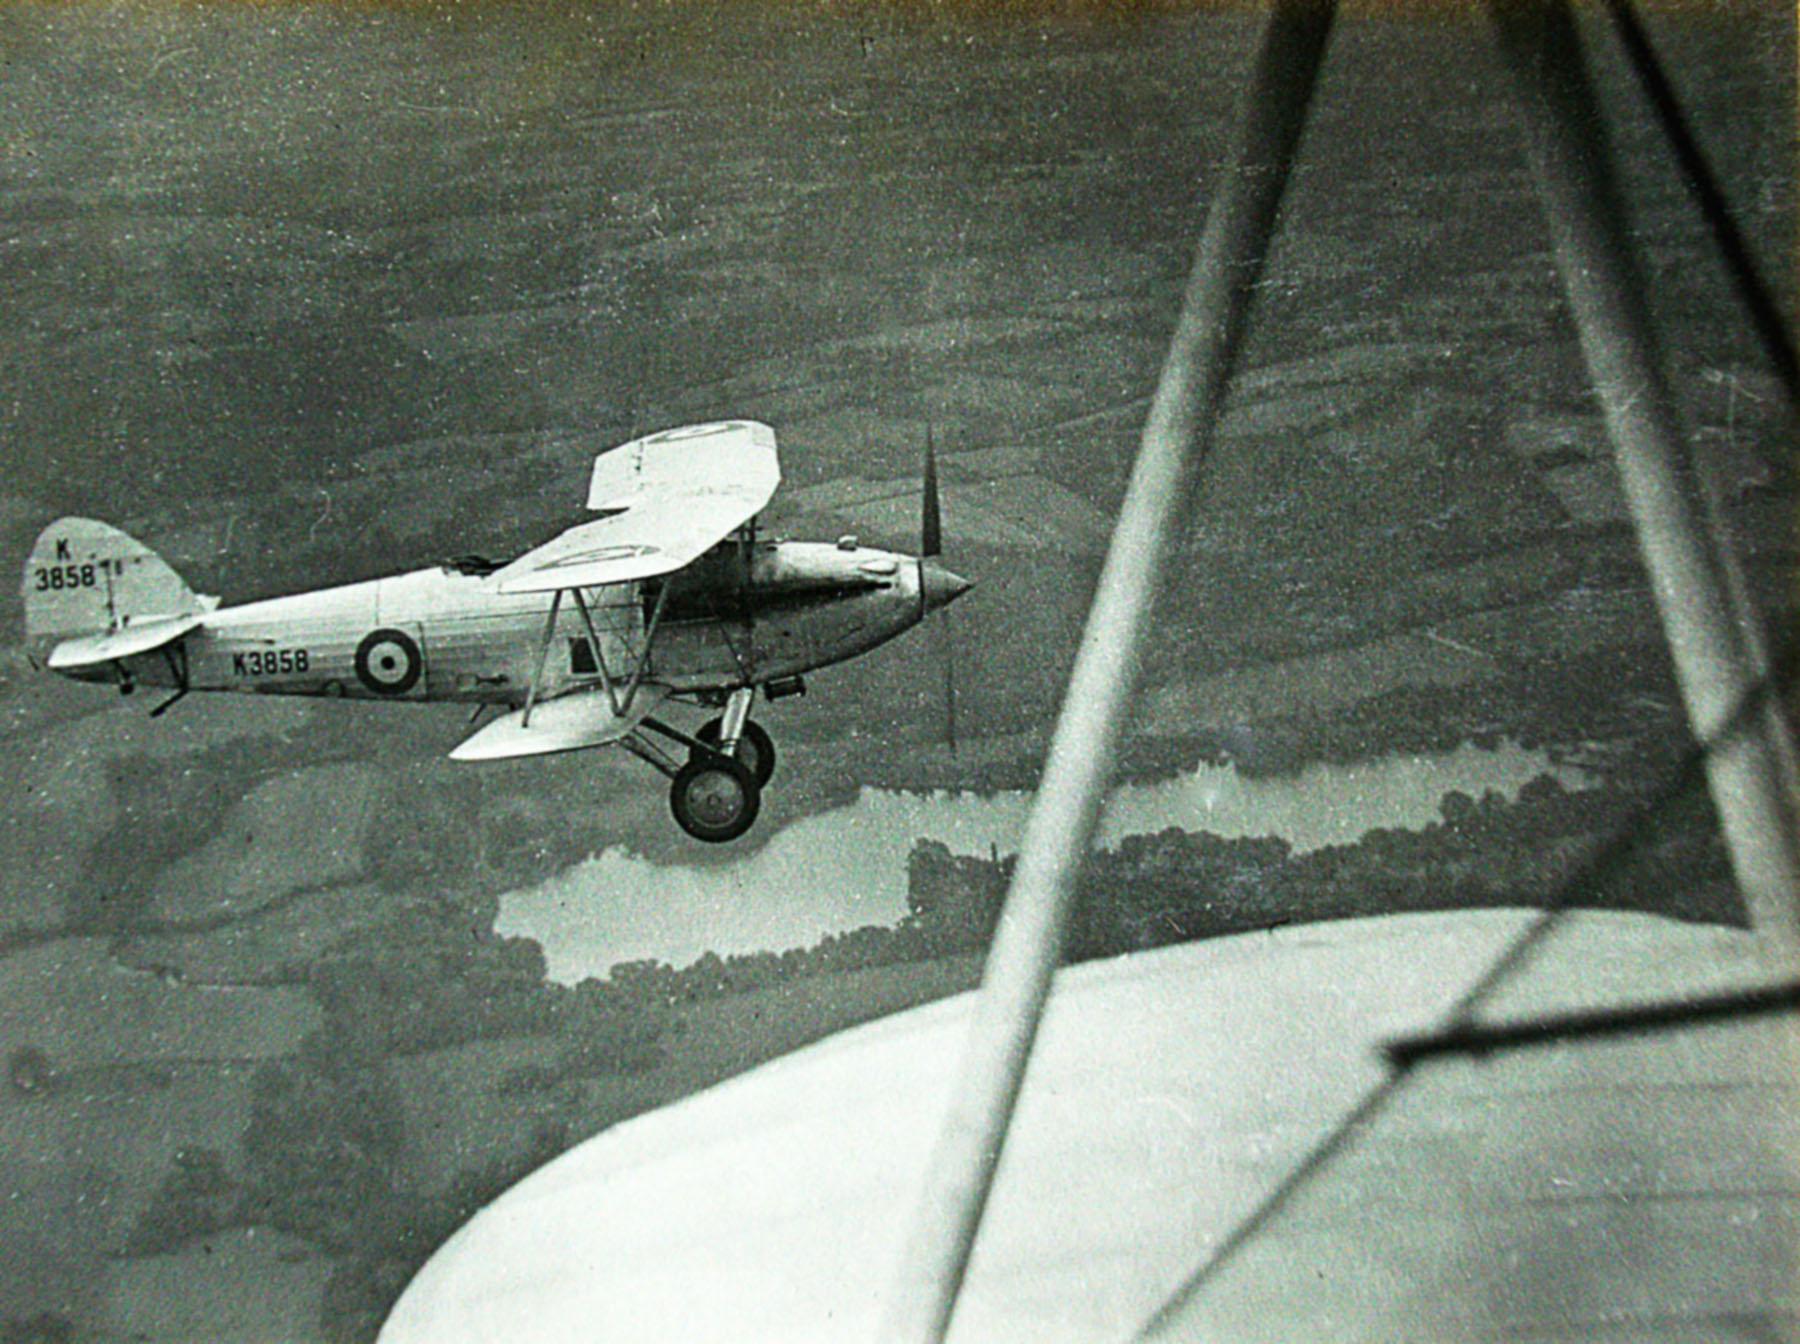 Hawker Hart I RAF K3858 trainer photo taken by Patrick Hayes KIA July 7 1940 01